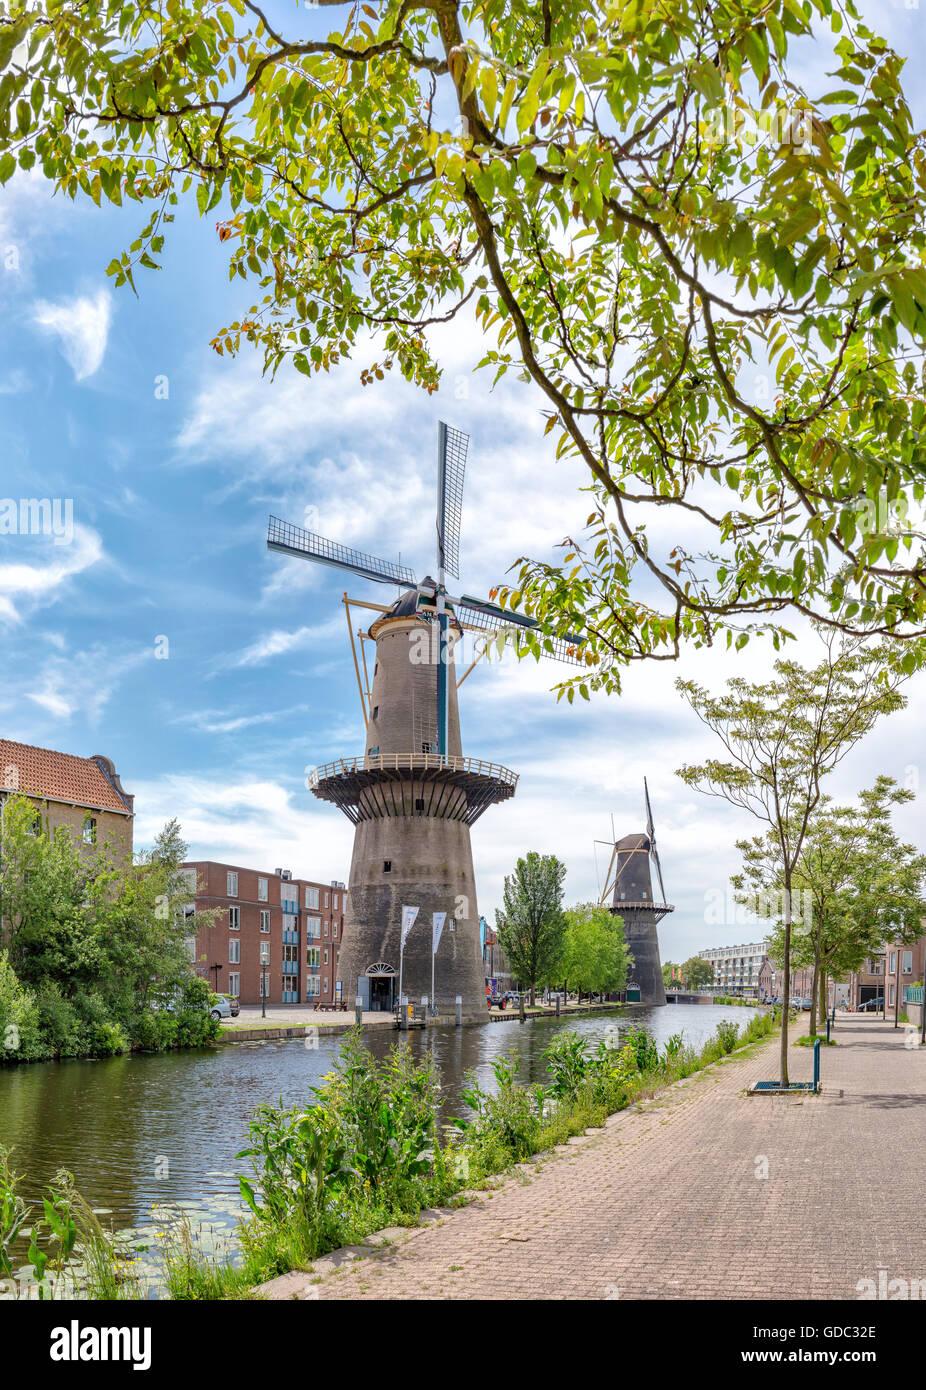 Schiedam, Turm Mühlen am Noordvest-Kanal Stockbild